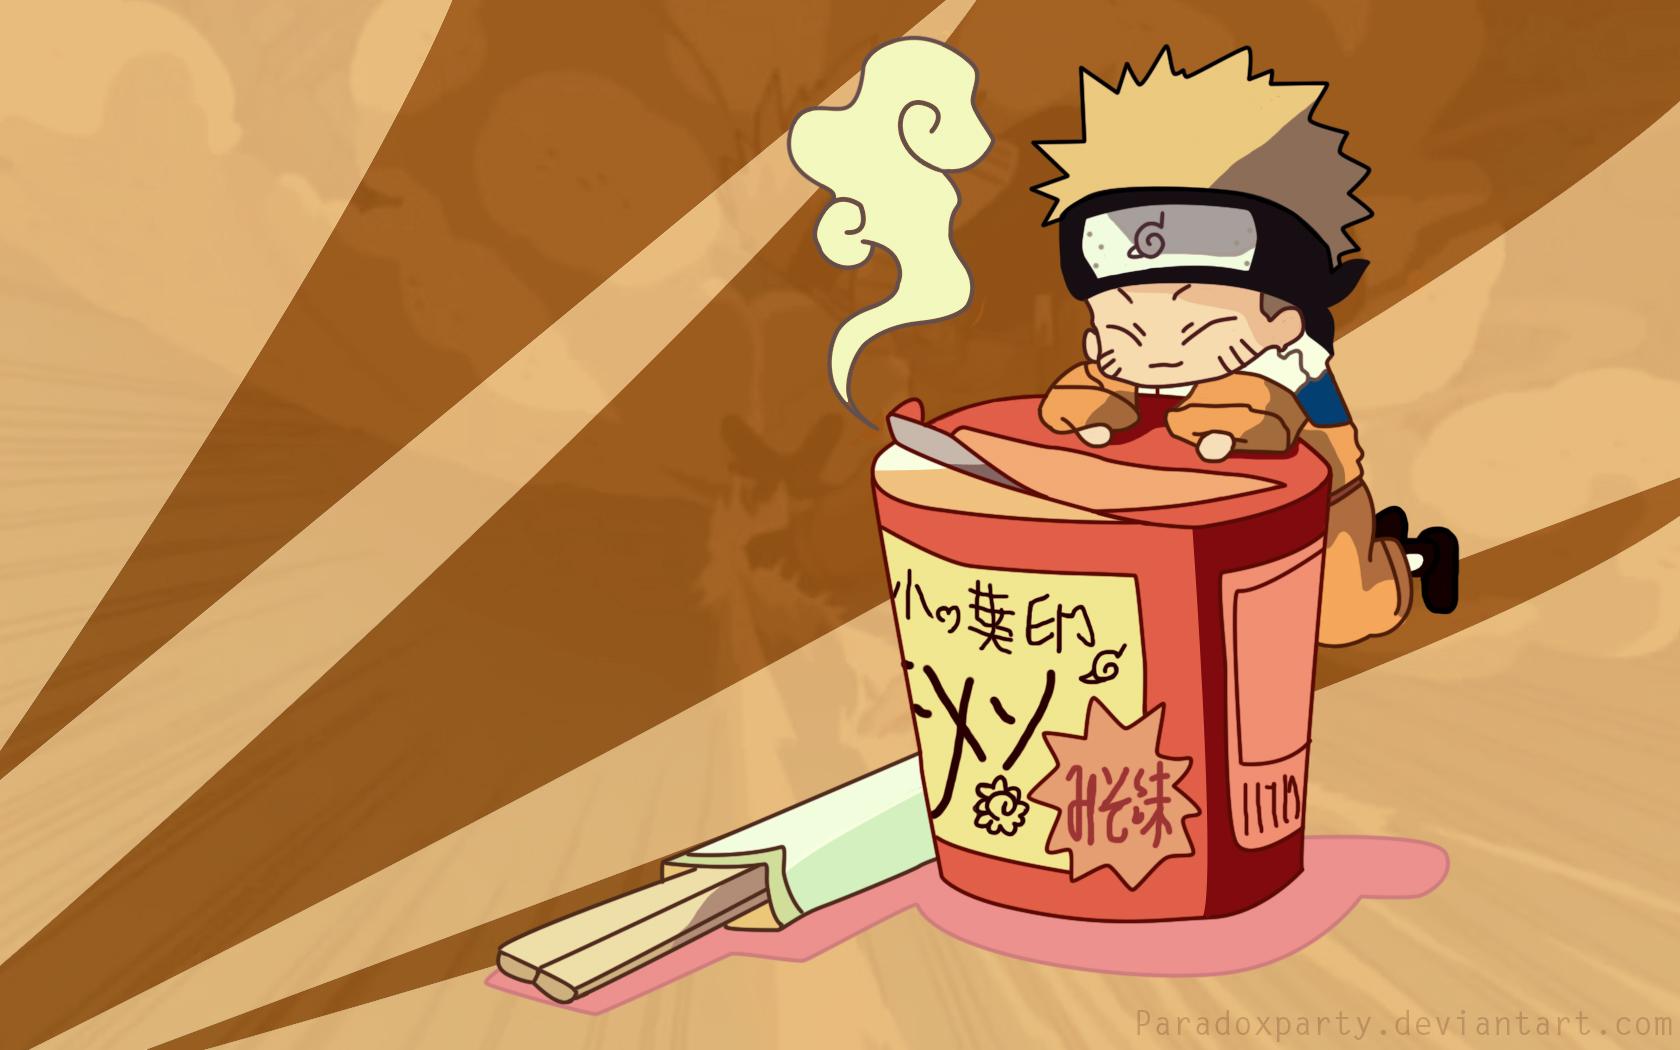 Naruto Res: 1680x1050 / Size:568kb. Views: 85806